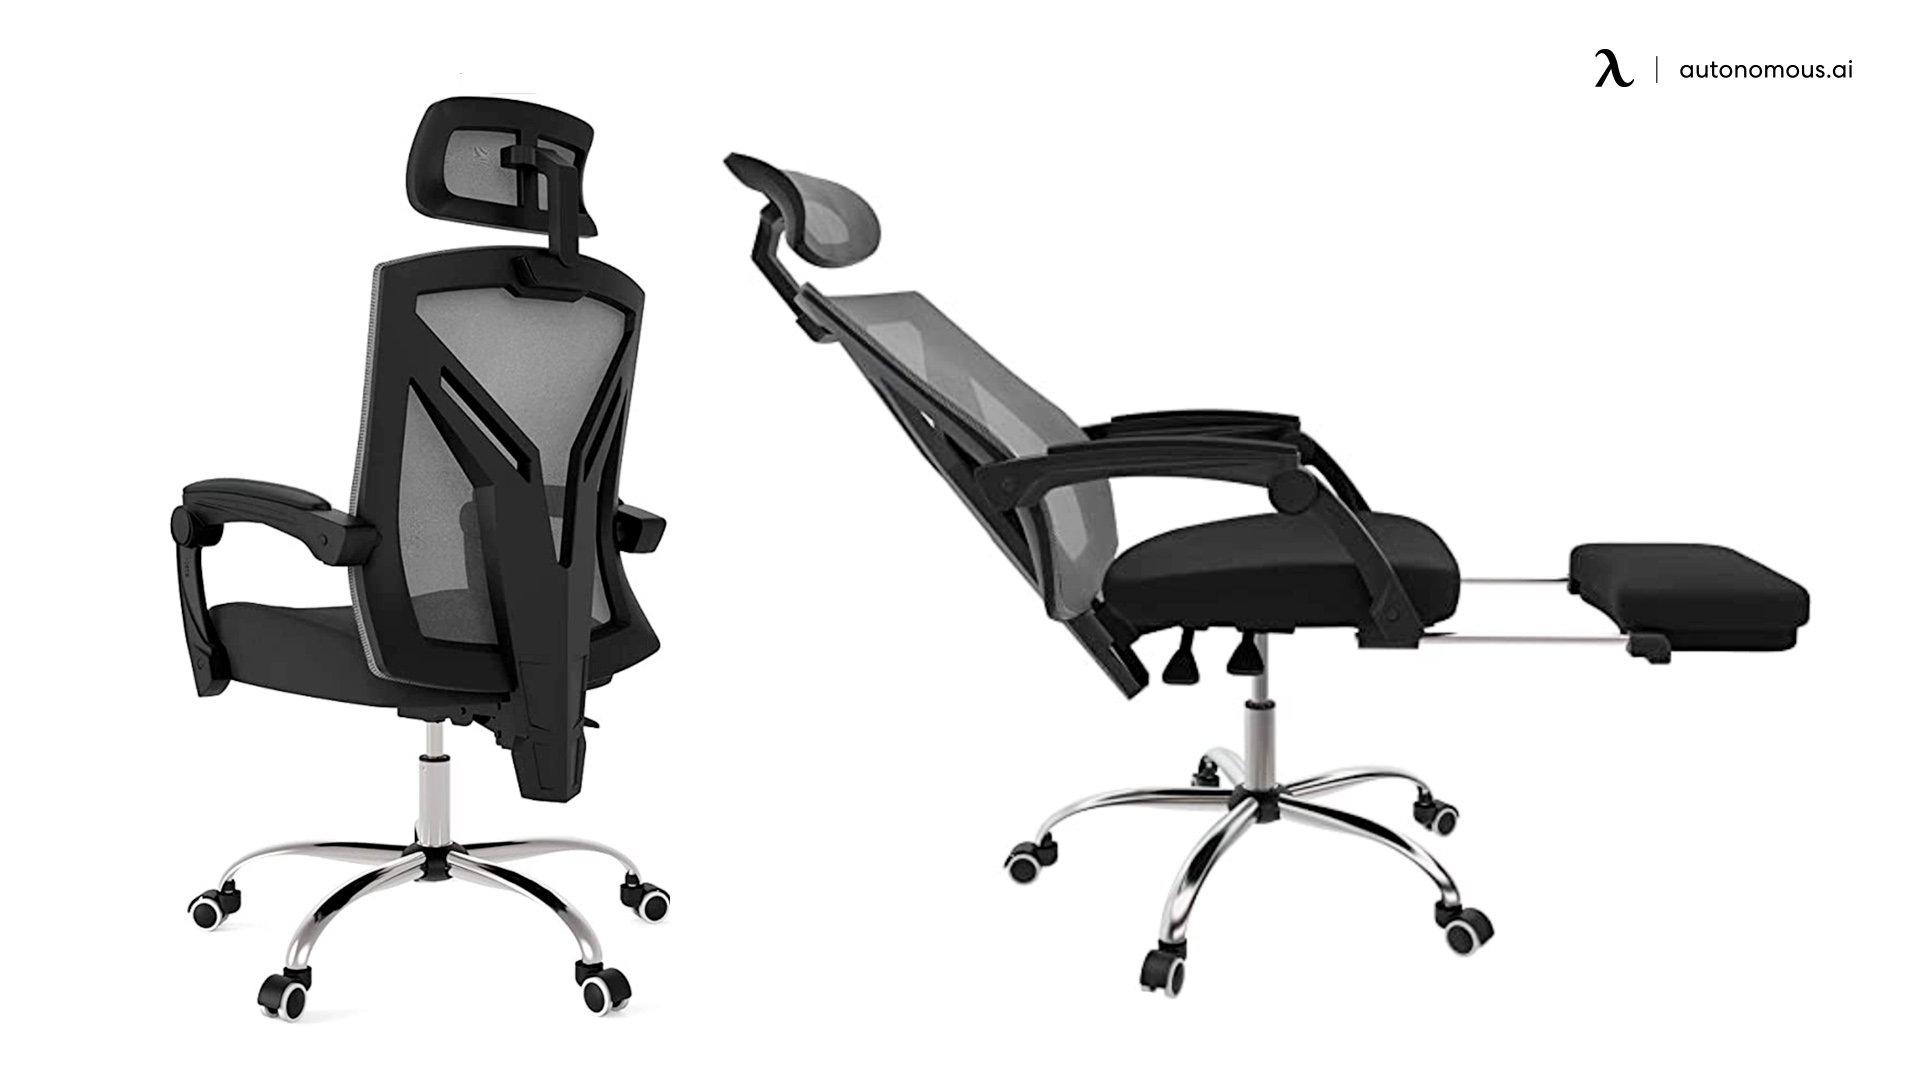 Hbada Ergonomic Home Office Chair